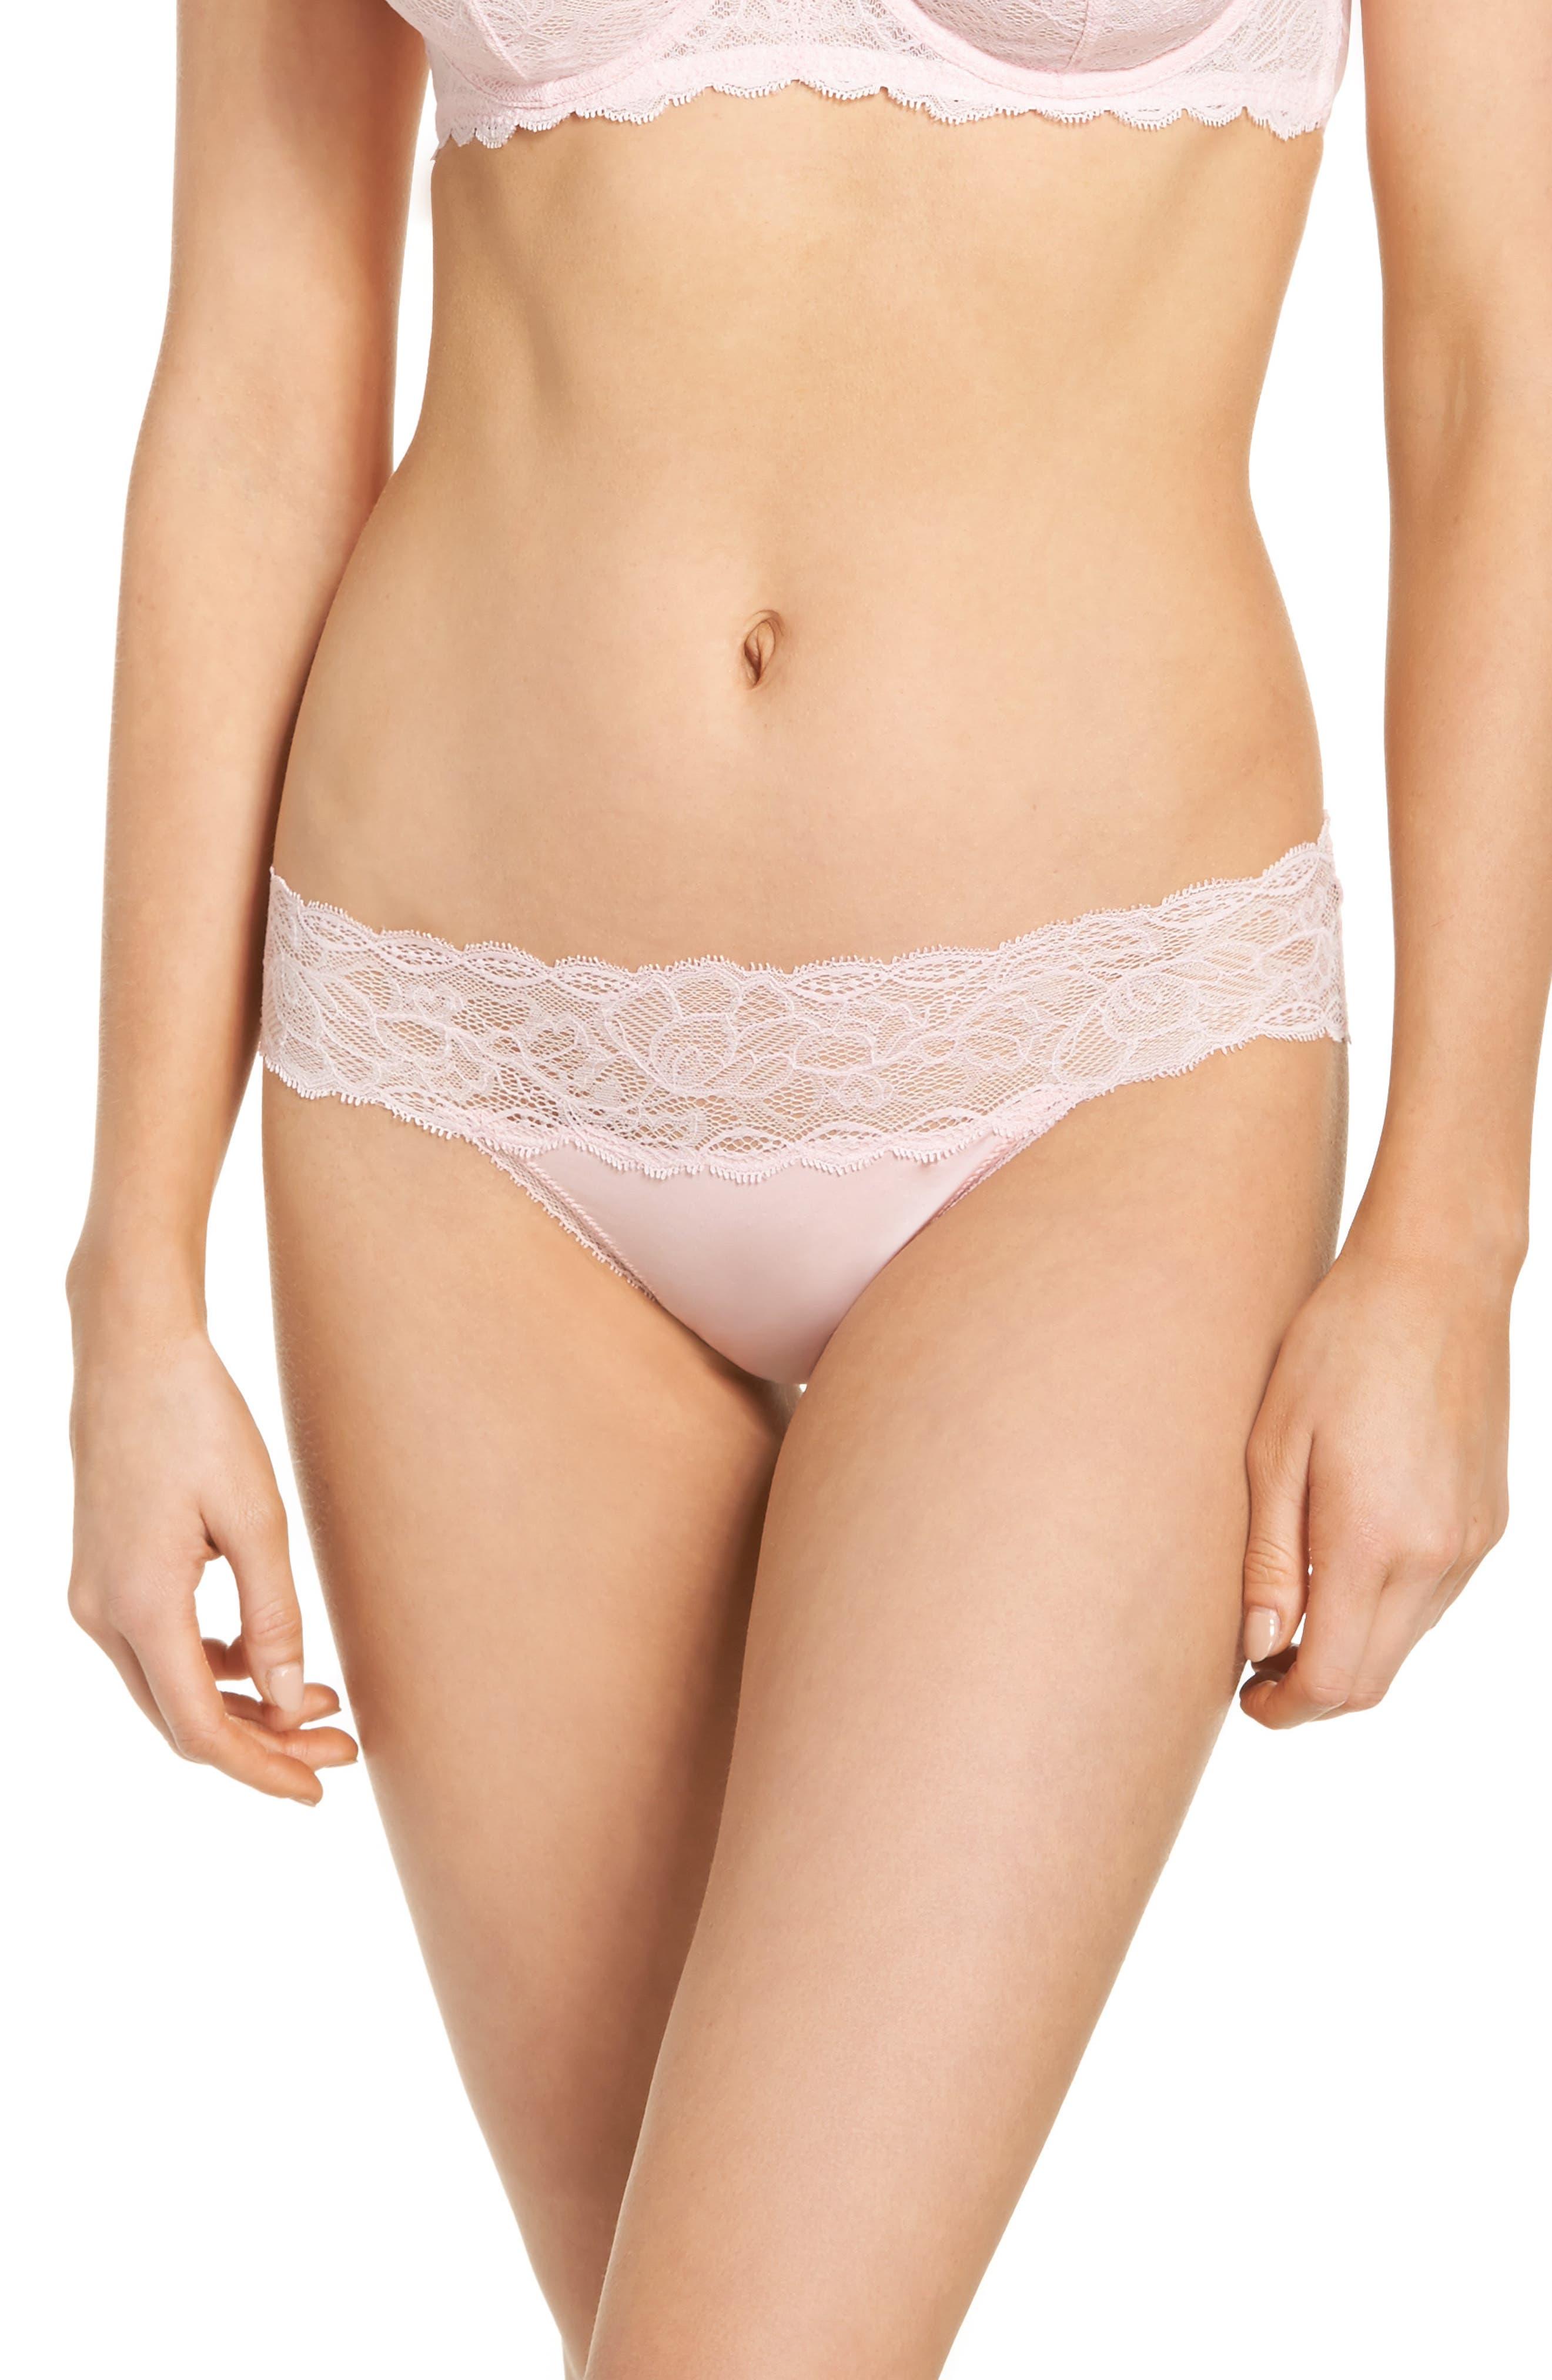 Seductive Comfort Lace Bikini,                             Main thumbnail 1, color,                             Attract